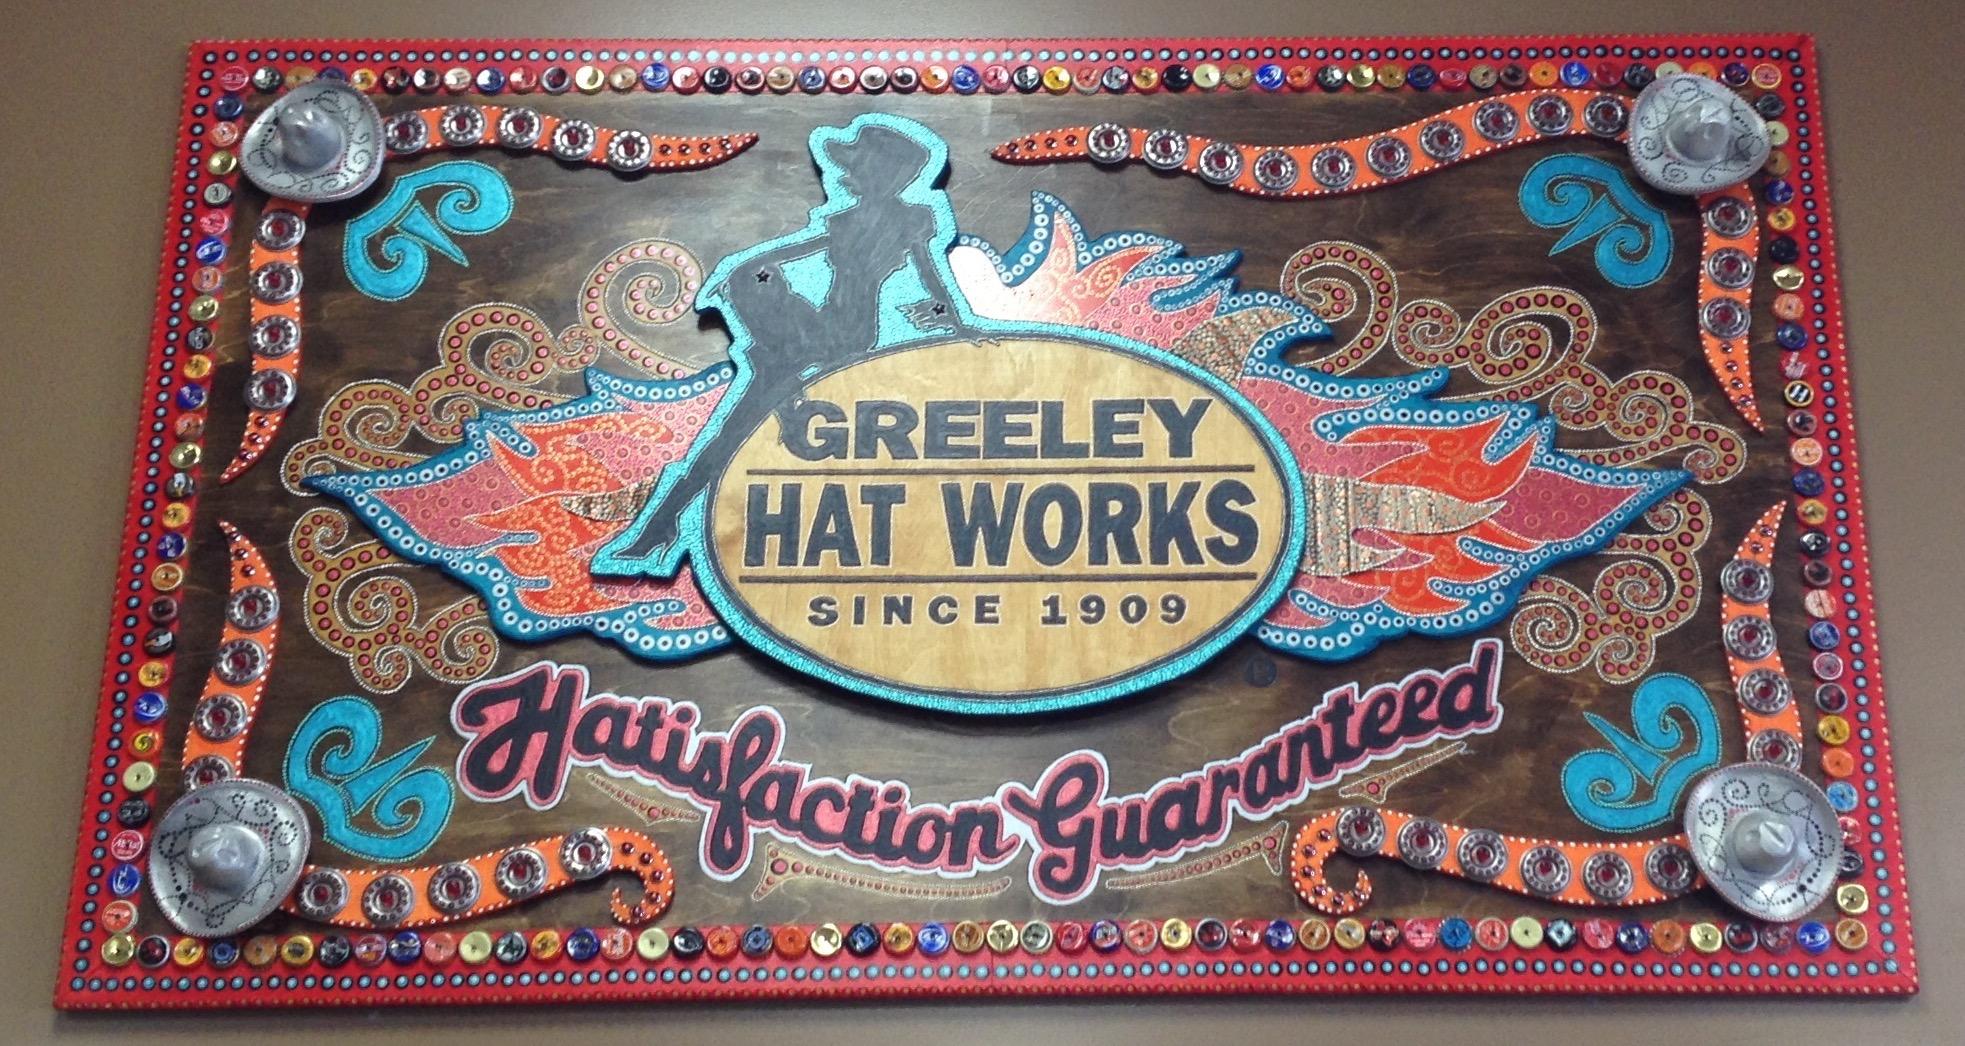 GREELEY HAT WORKS